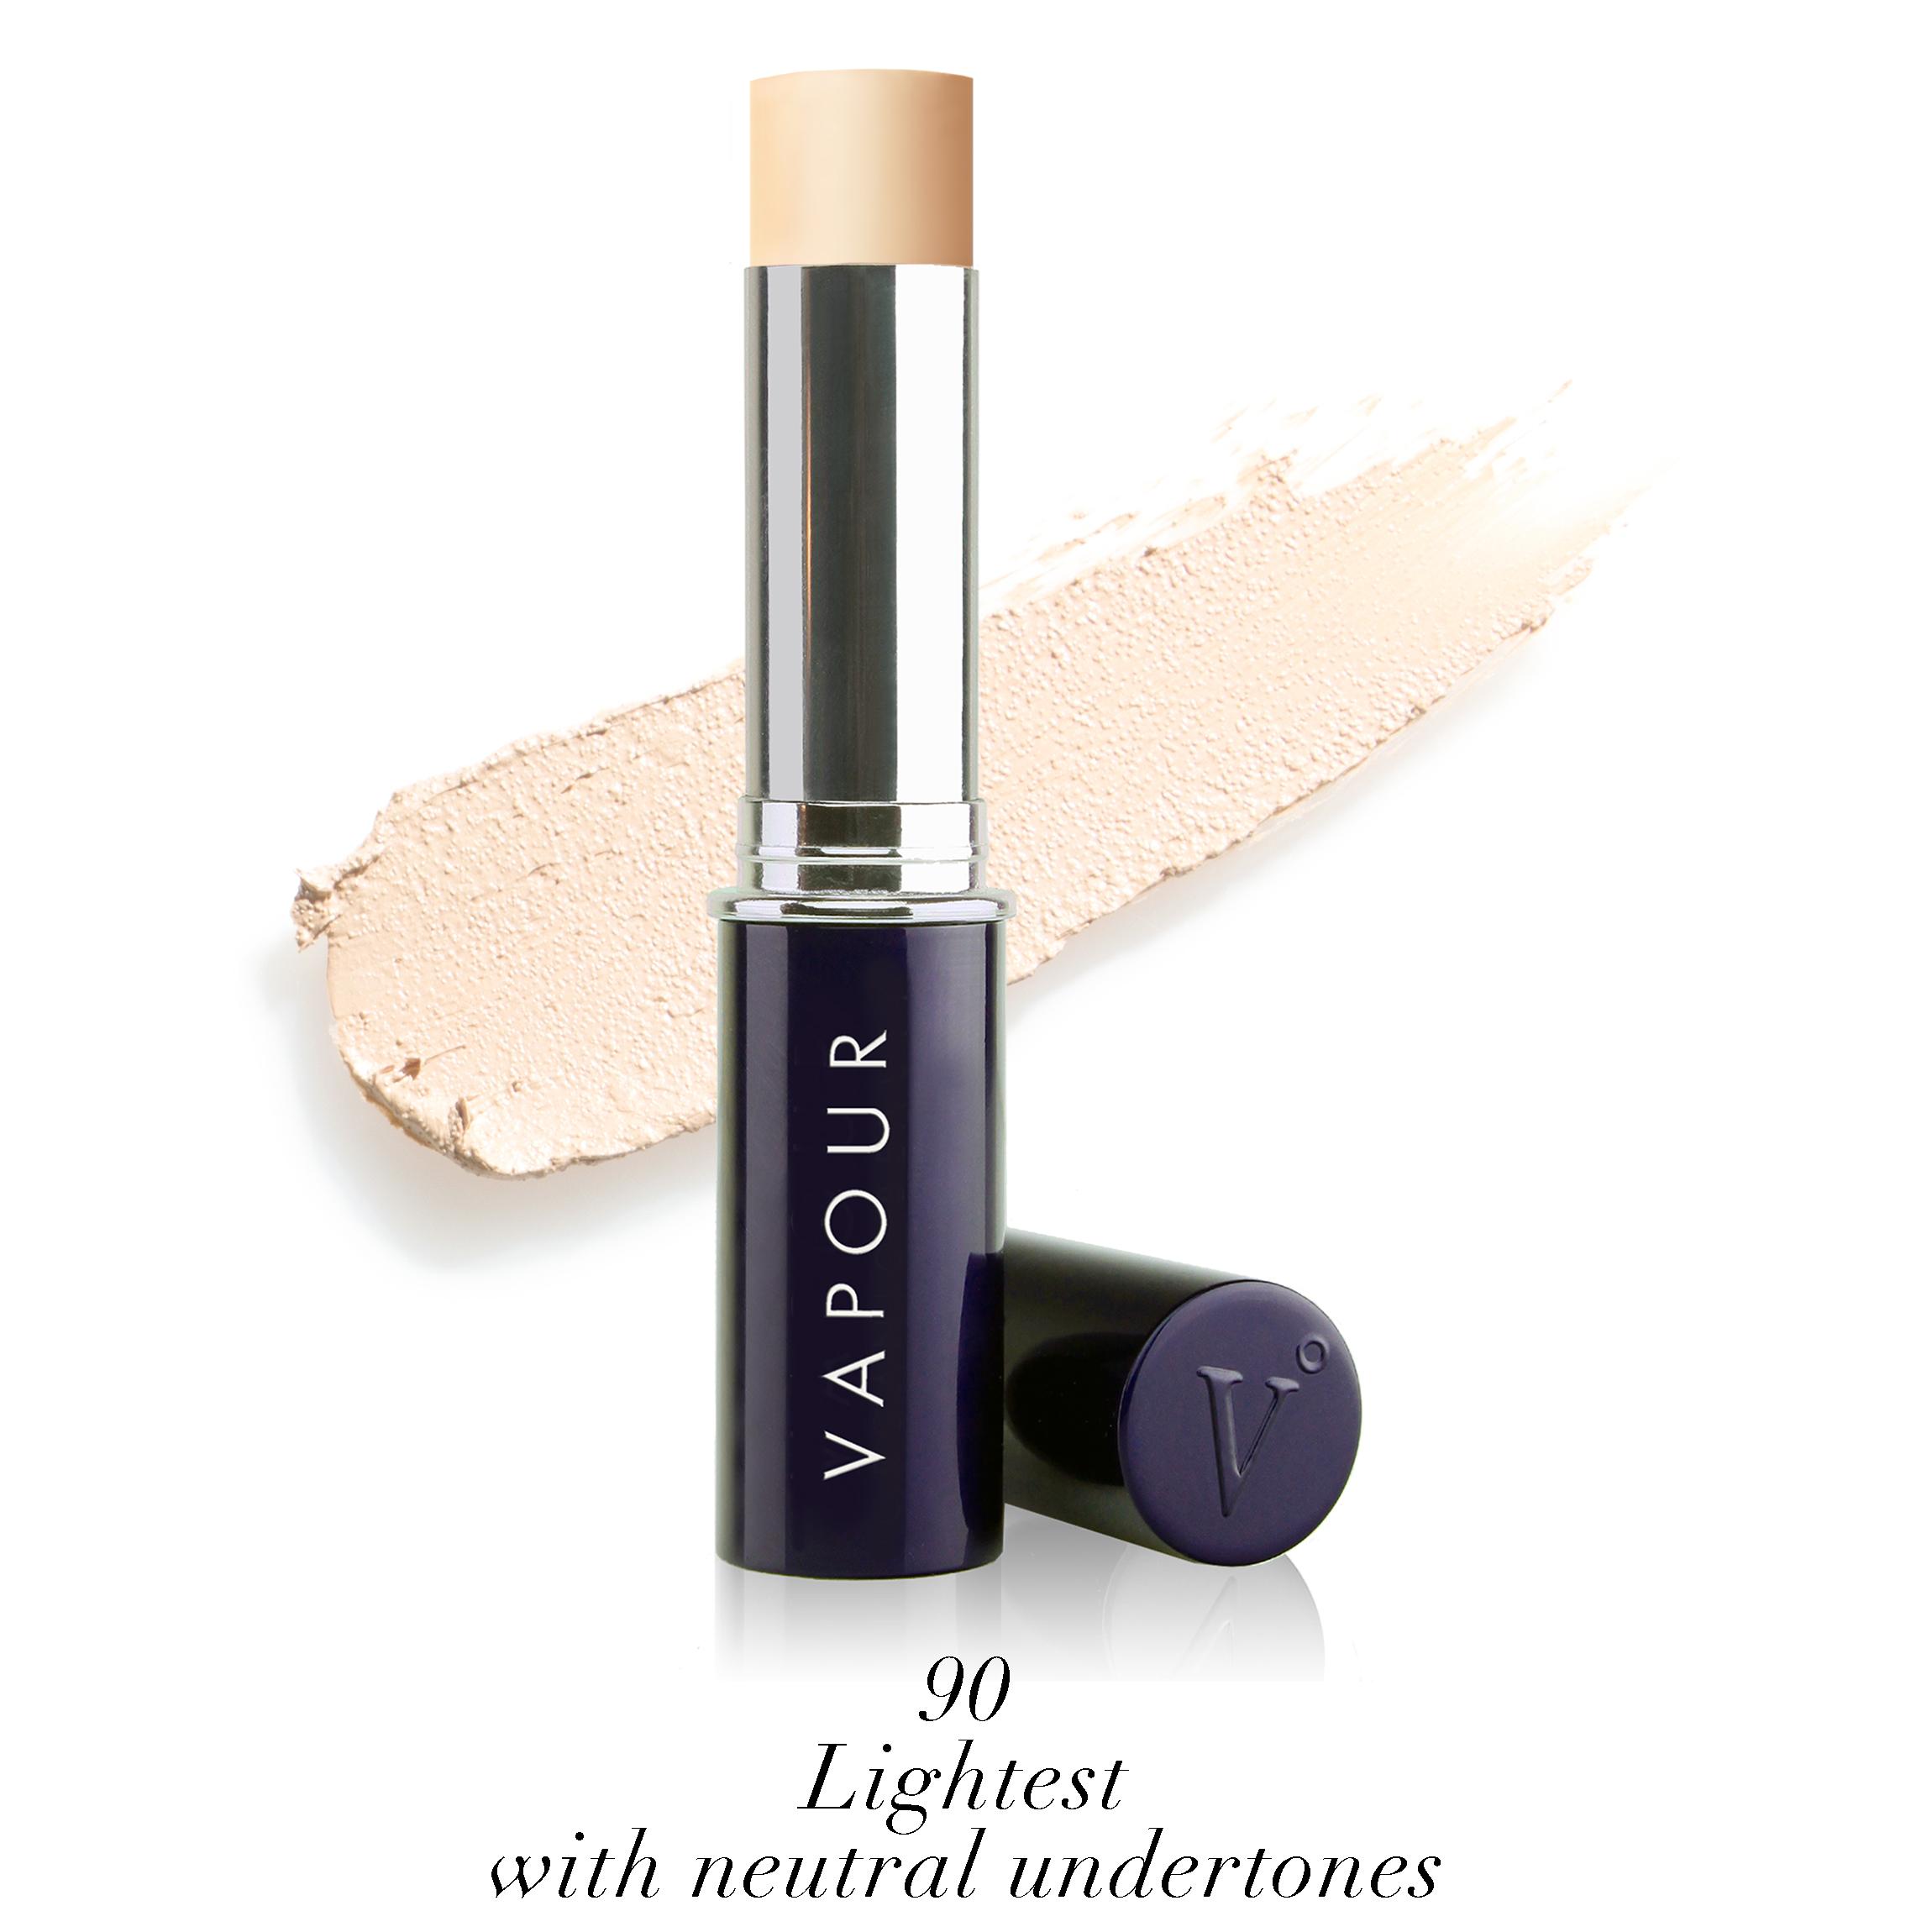 40f2c433799 Atmosphere Luminous Foundation | Vapour Organic Beauty